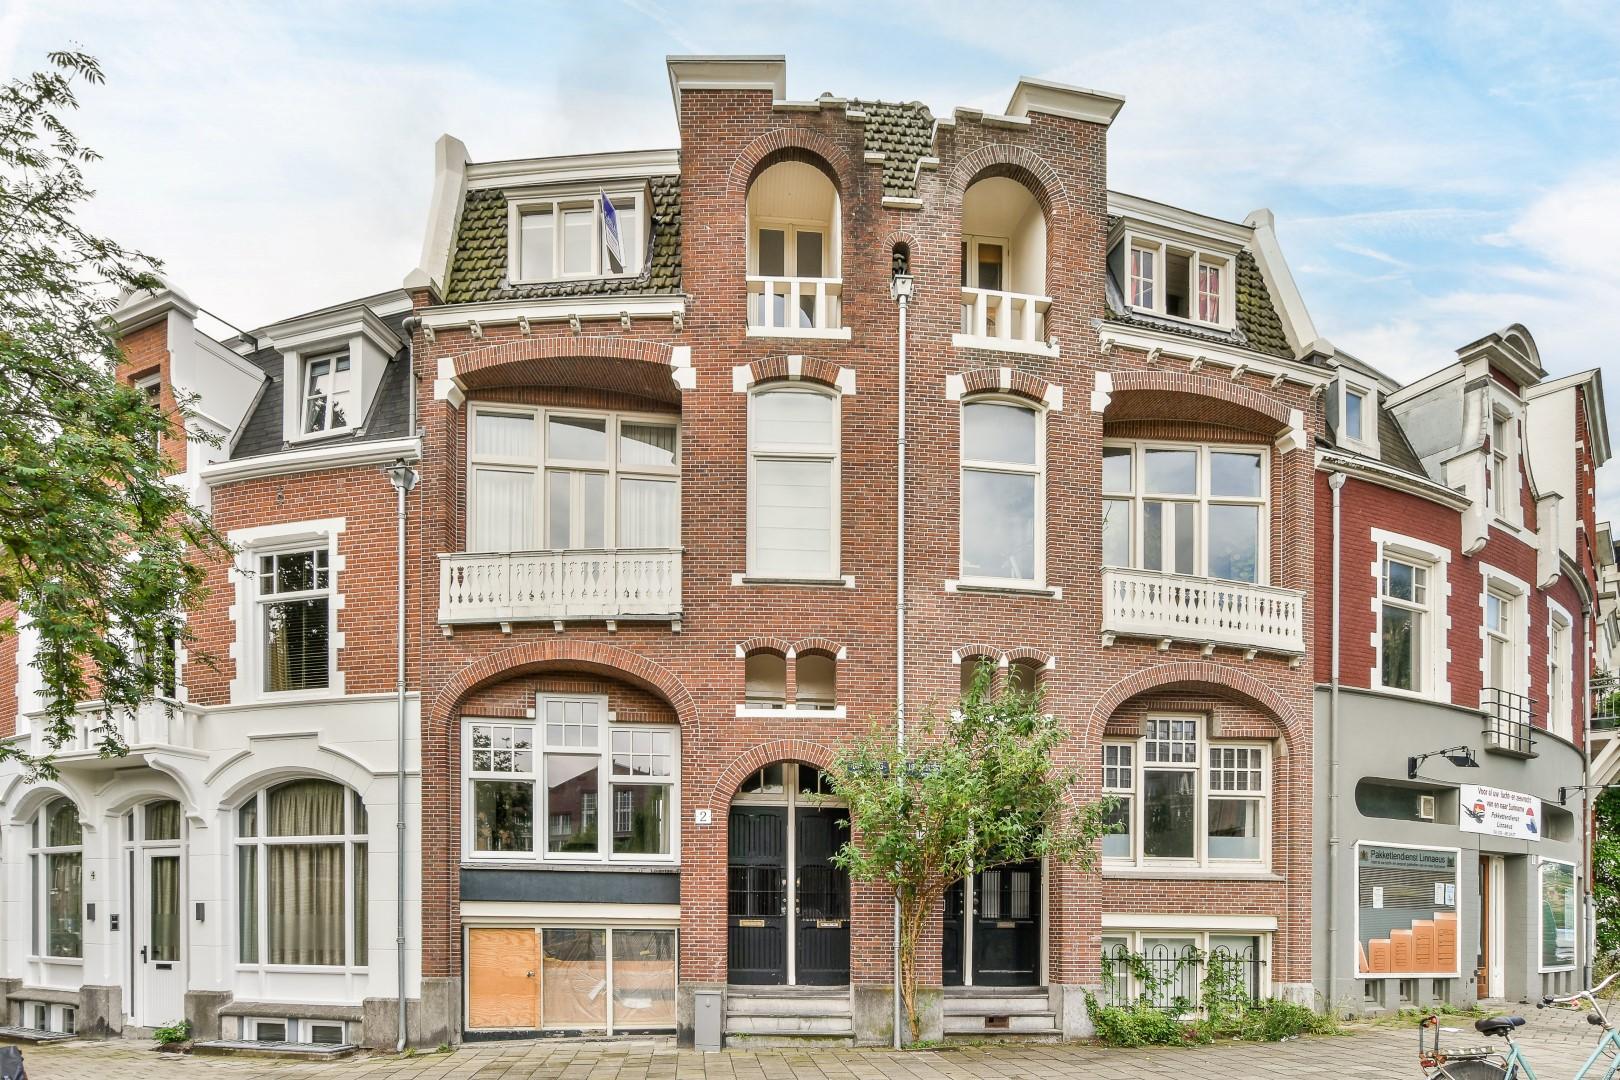 Bredeweg 2-A 1098 BP, Amsterdam, Noord-Holland Nederland, 2 Slaapkamers Slaapkamers, ,1 BadkamerBadkamers,Appartement,Huur,Bredeweg 2-A,1571